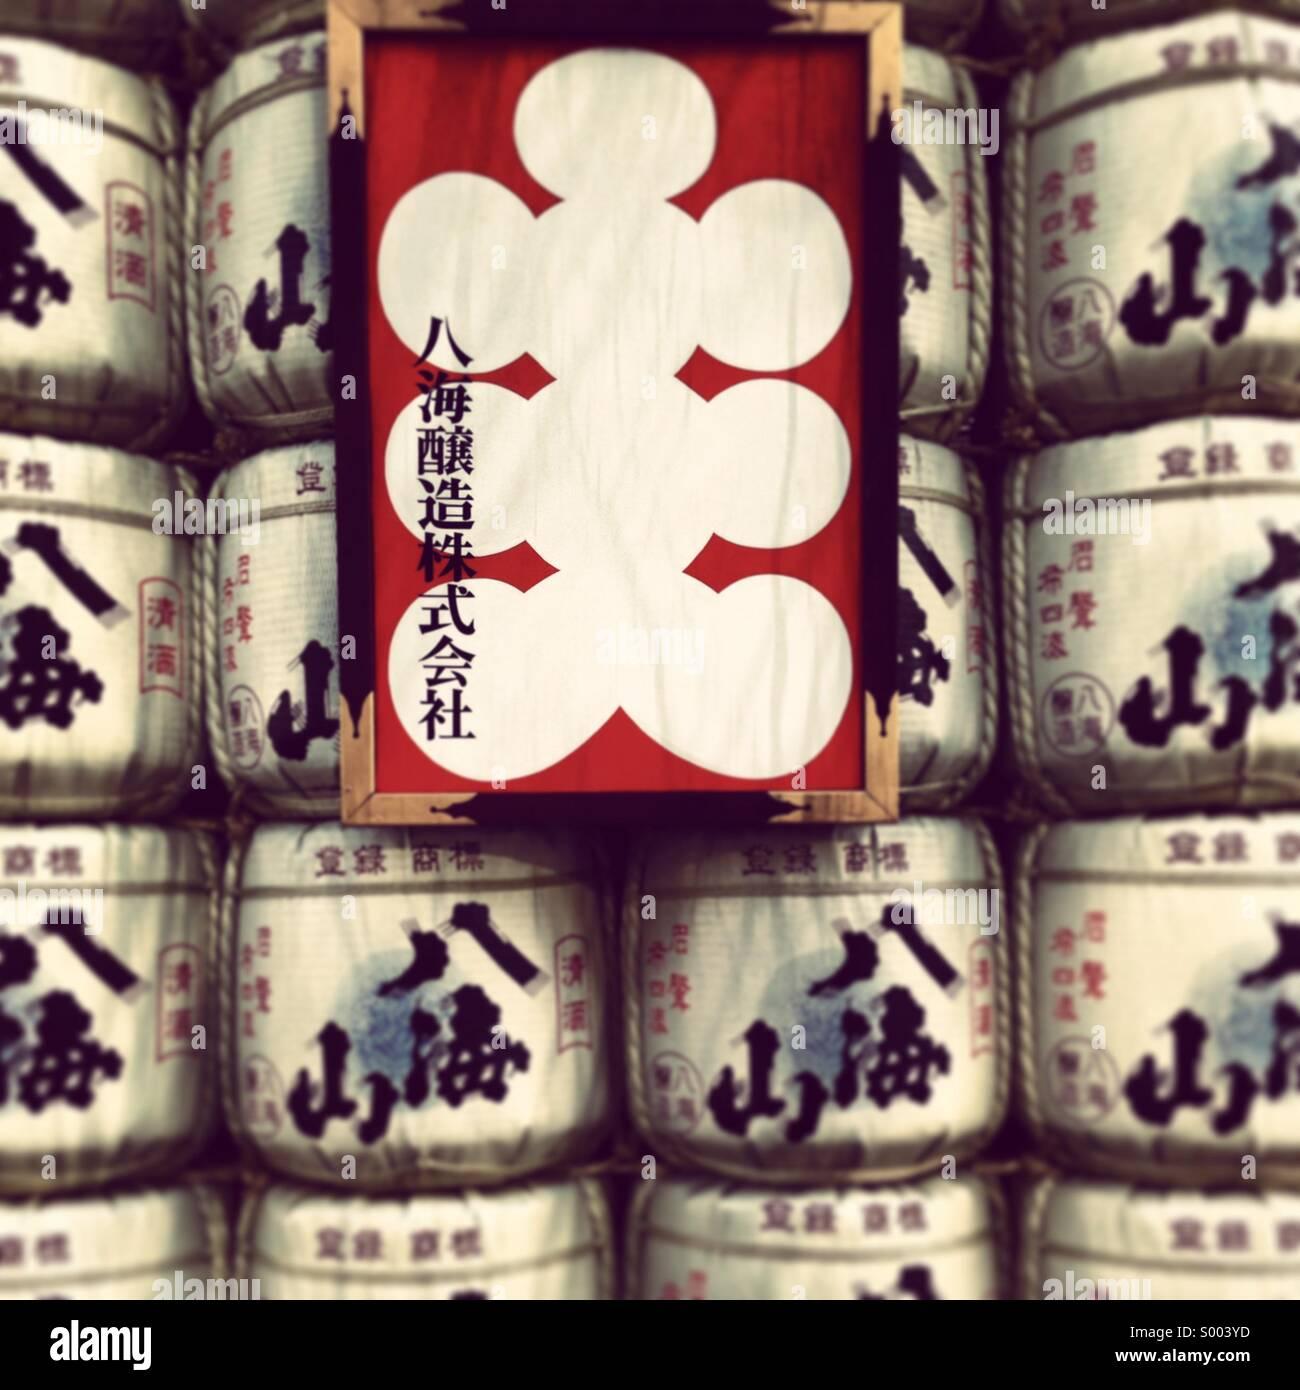 Japanese sake barrels in front of Kabuki-za theatre in Ginza, Tokyo, Japan - Stock Image